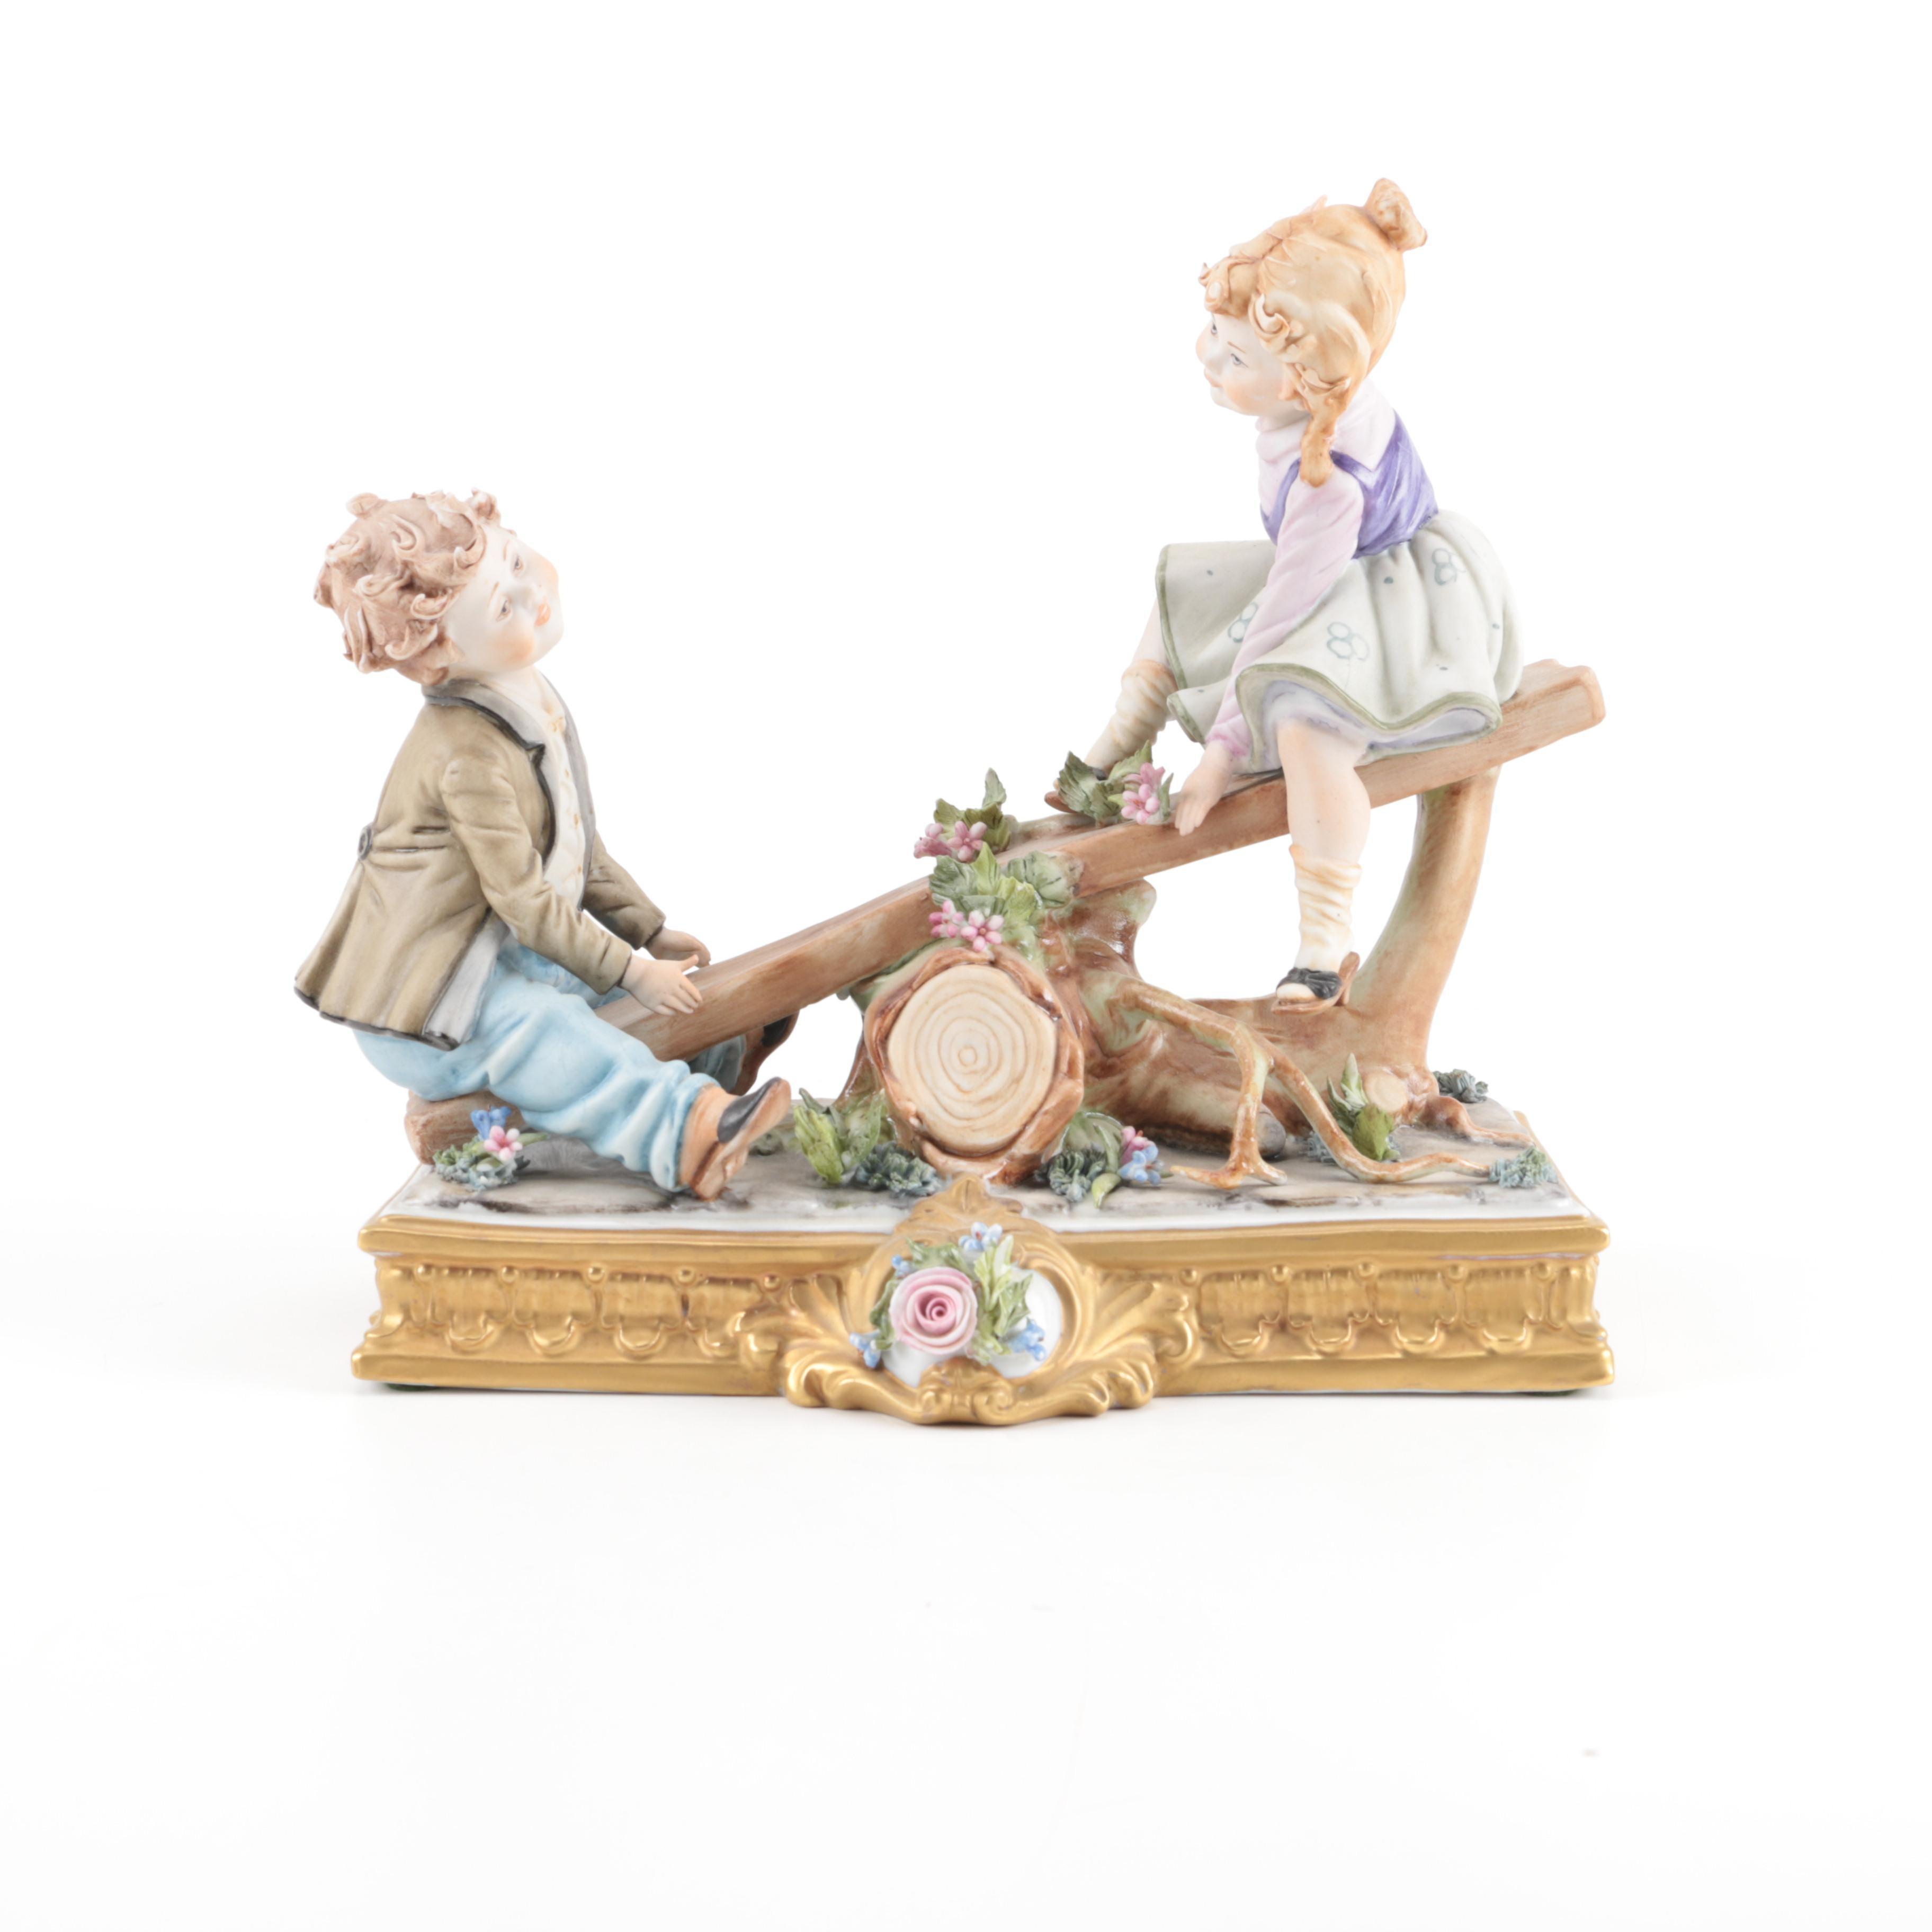 Viertasca Capodimonte Seesaw Porcelain Figurine